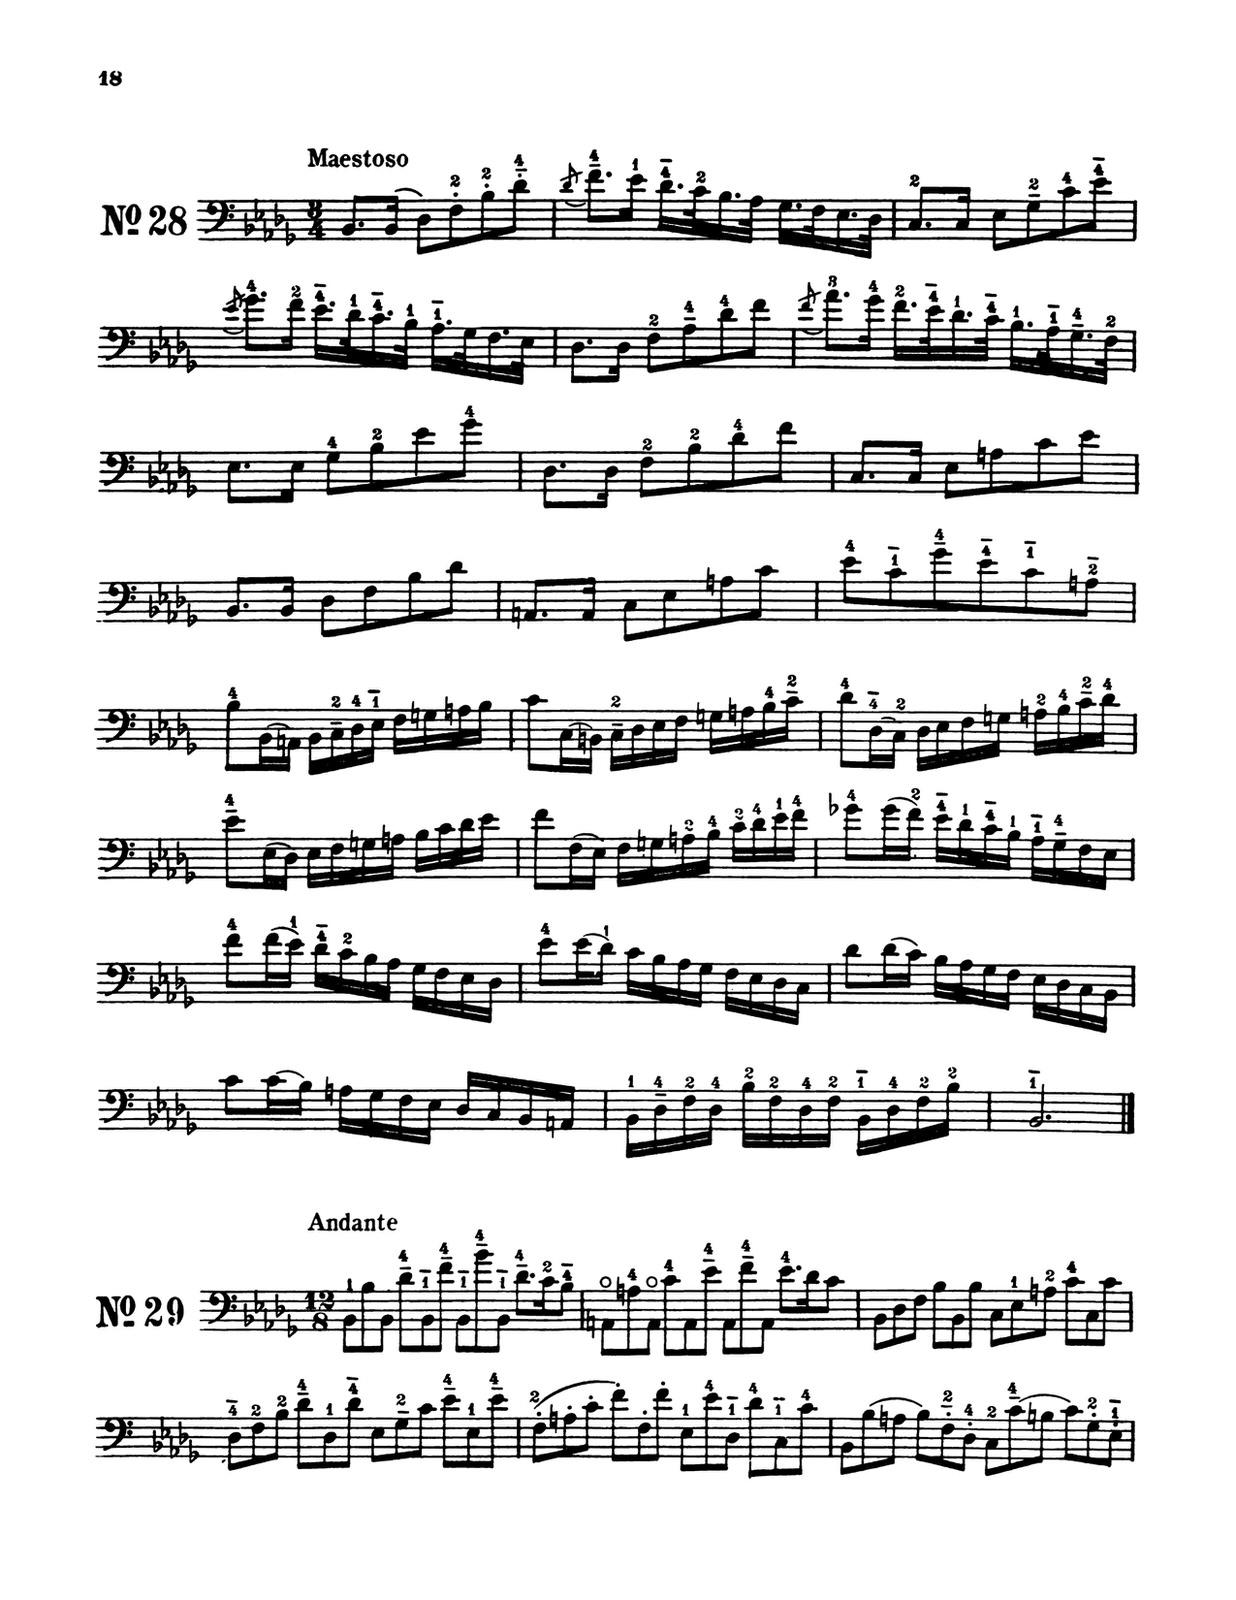 Slama, 66 Etudes in all Major and Minor Keys for Trombone, Tuba, Bassoon String Bass 4